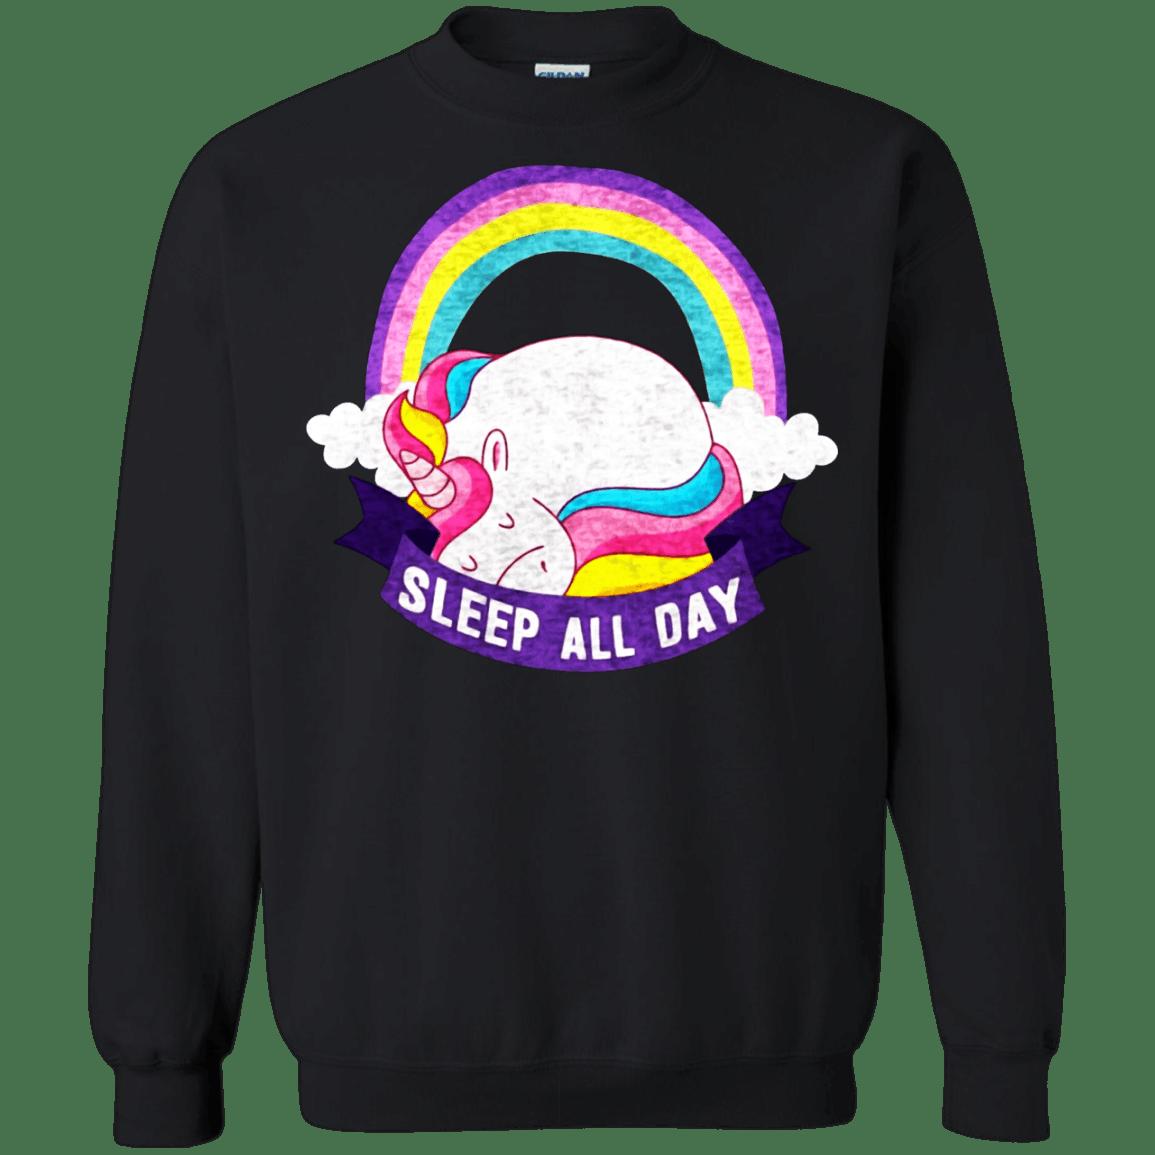 Sleep all day shirt